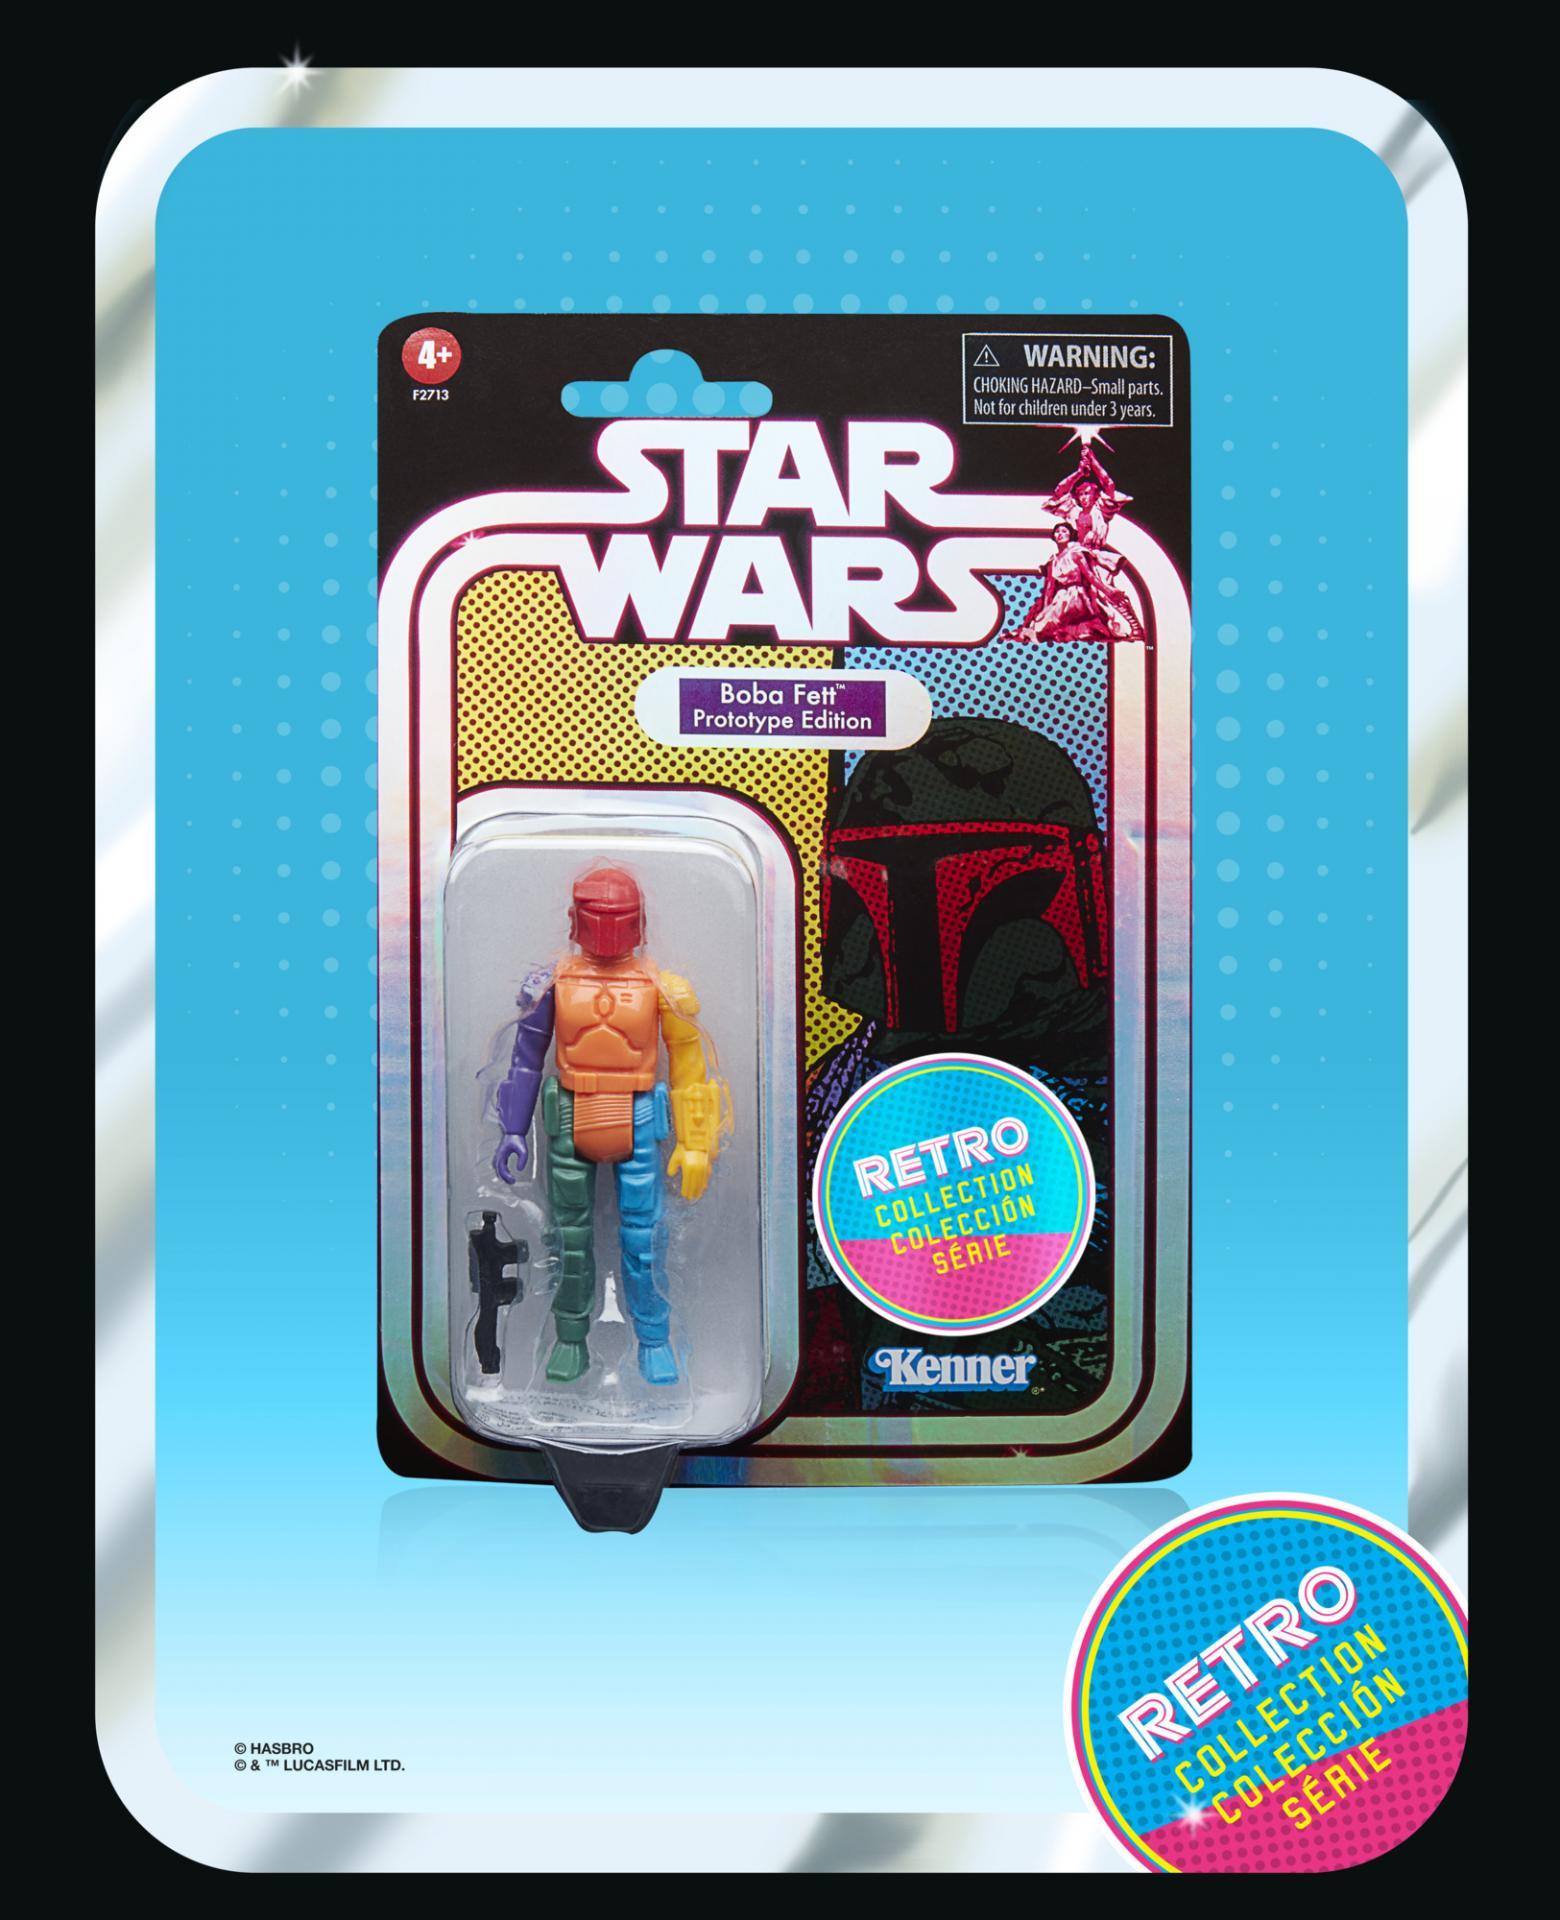 Star wars the retro collection boba fett prototype edition